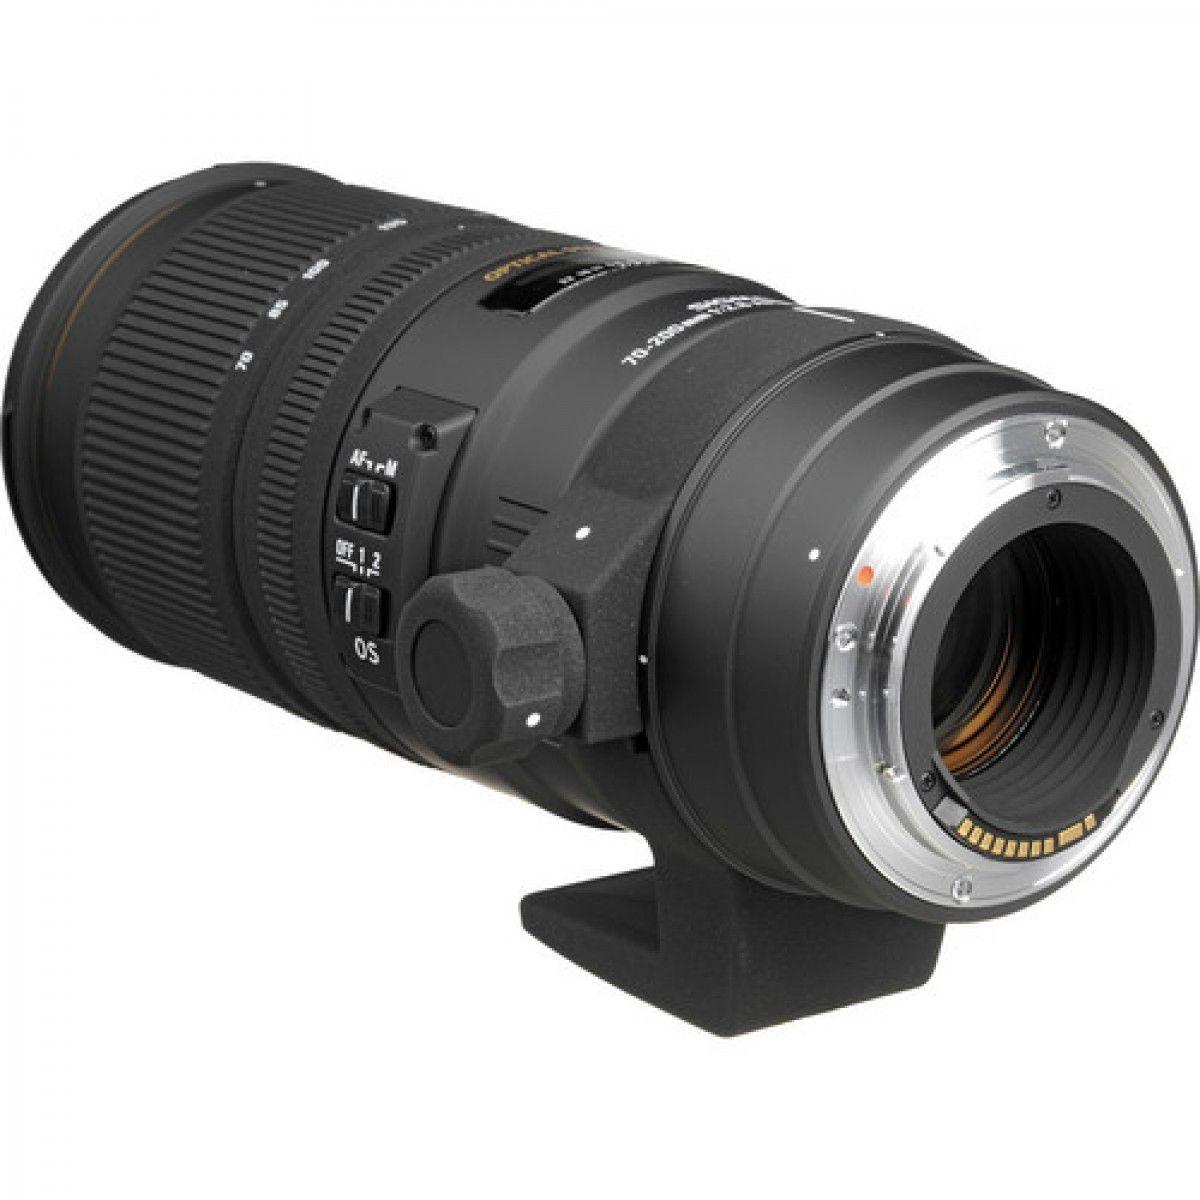 SIGMA 70-200MM F/2.8 EX DG APO OS HSM PARA CANON